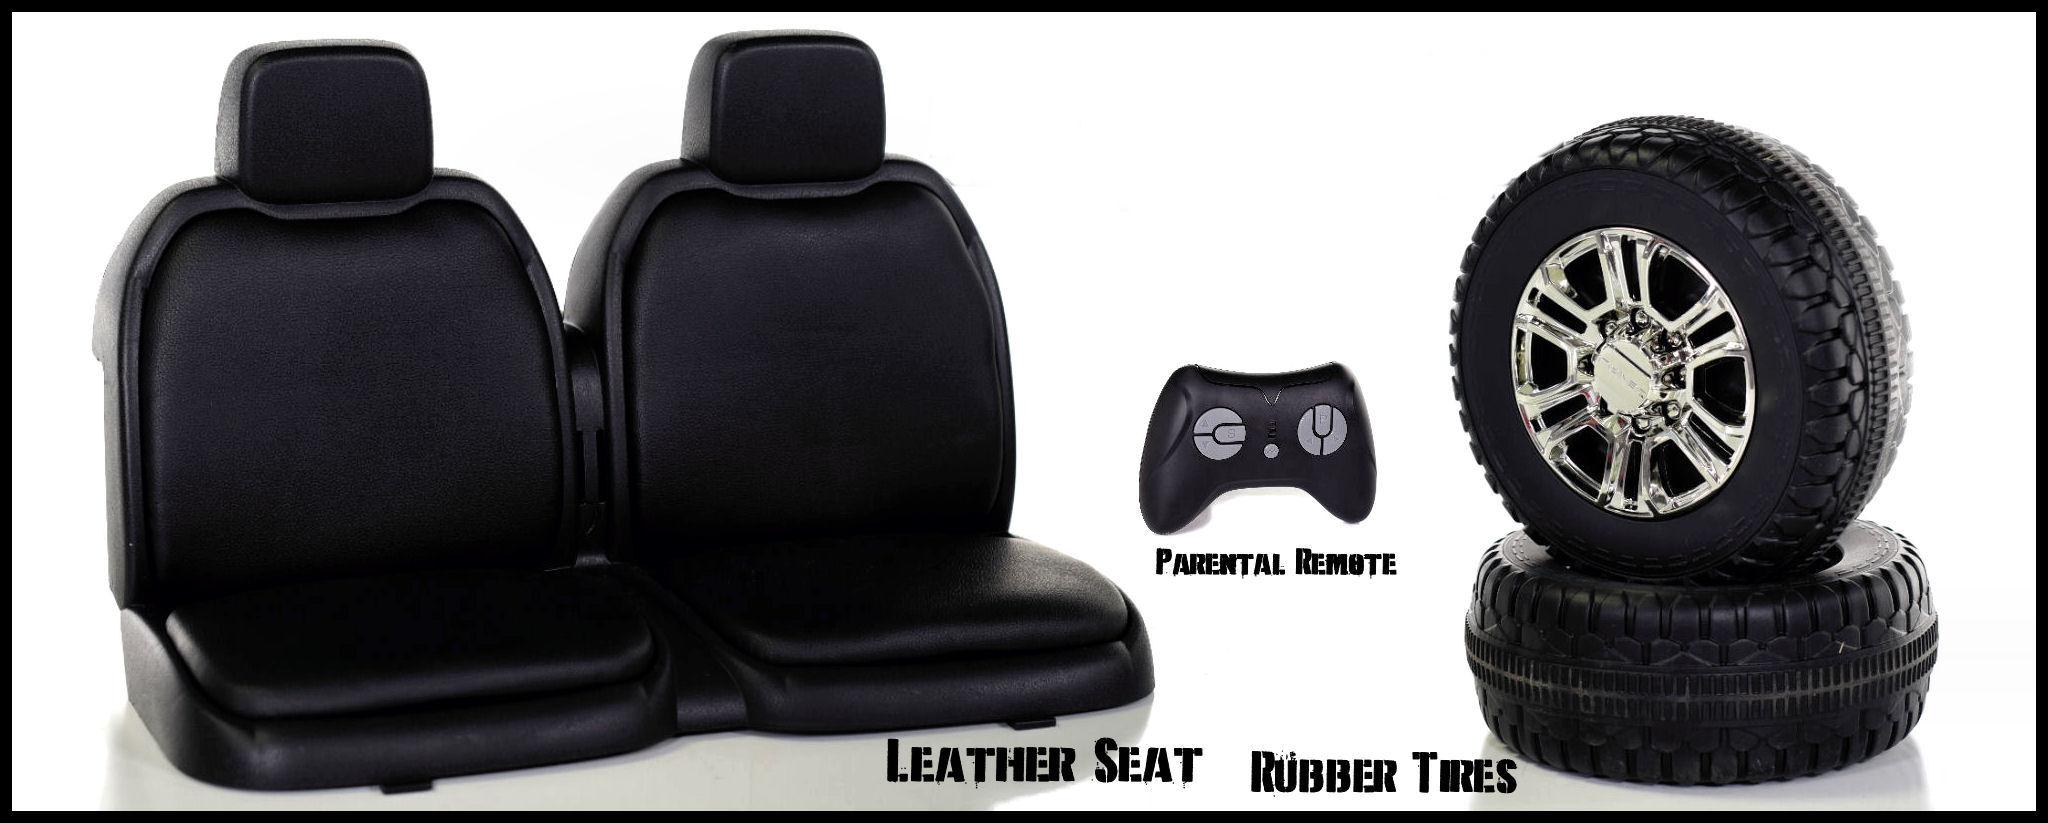 gmc-seat-tires-remote.jpg